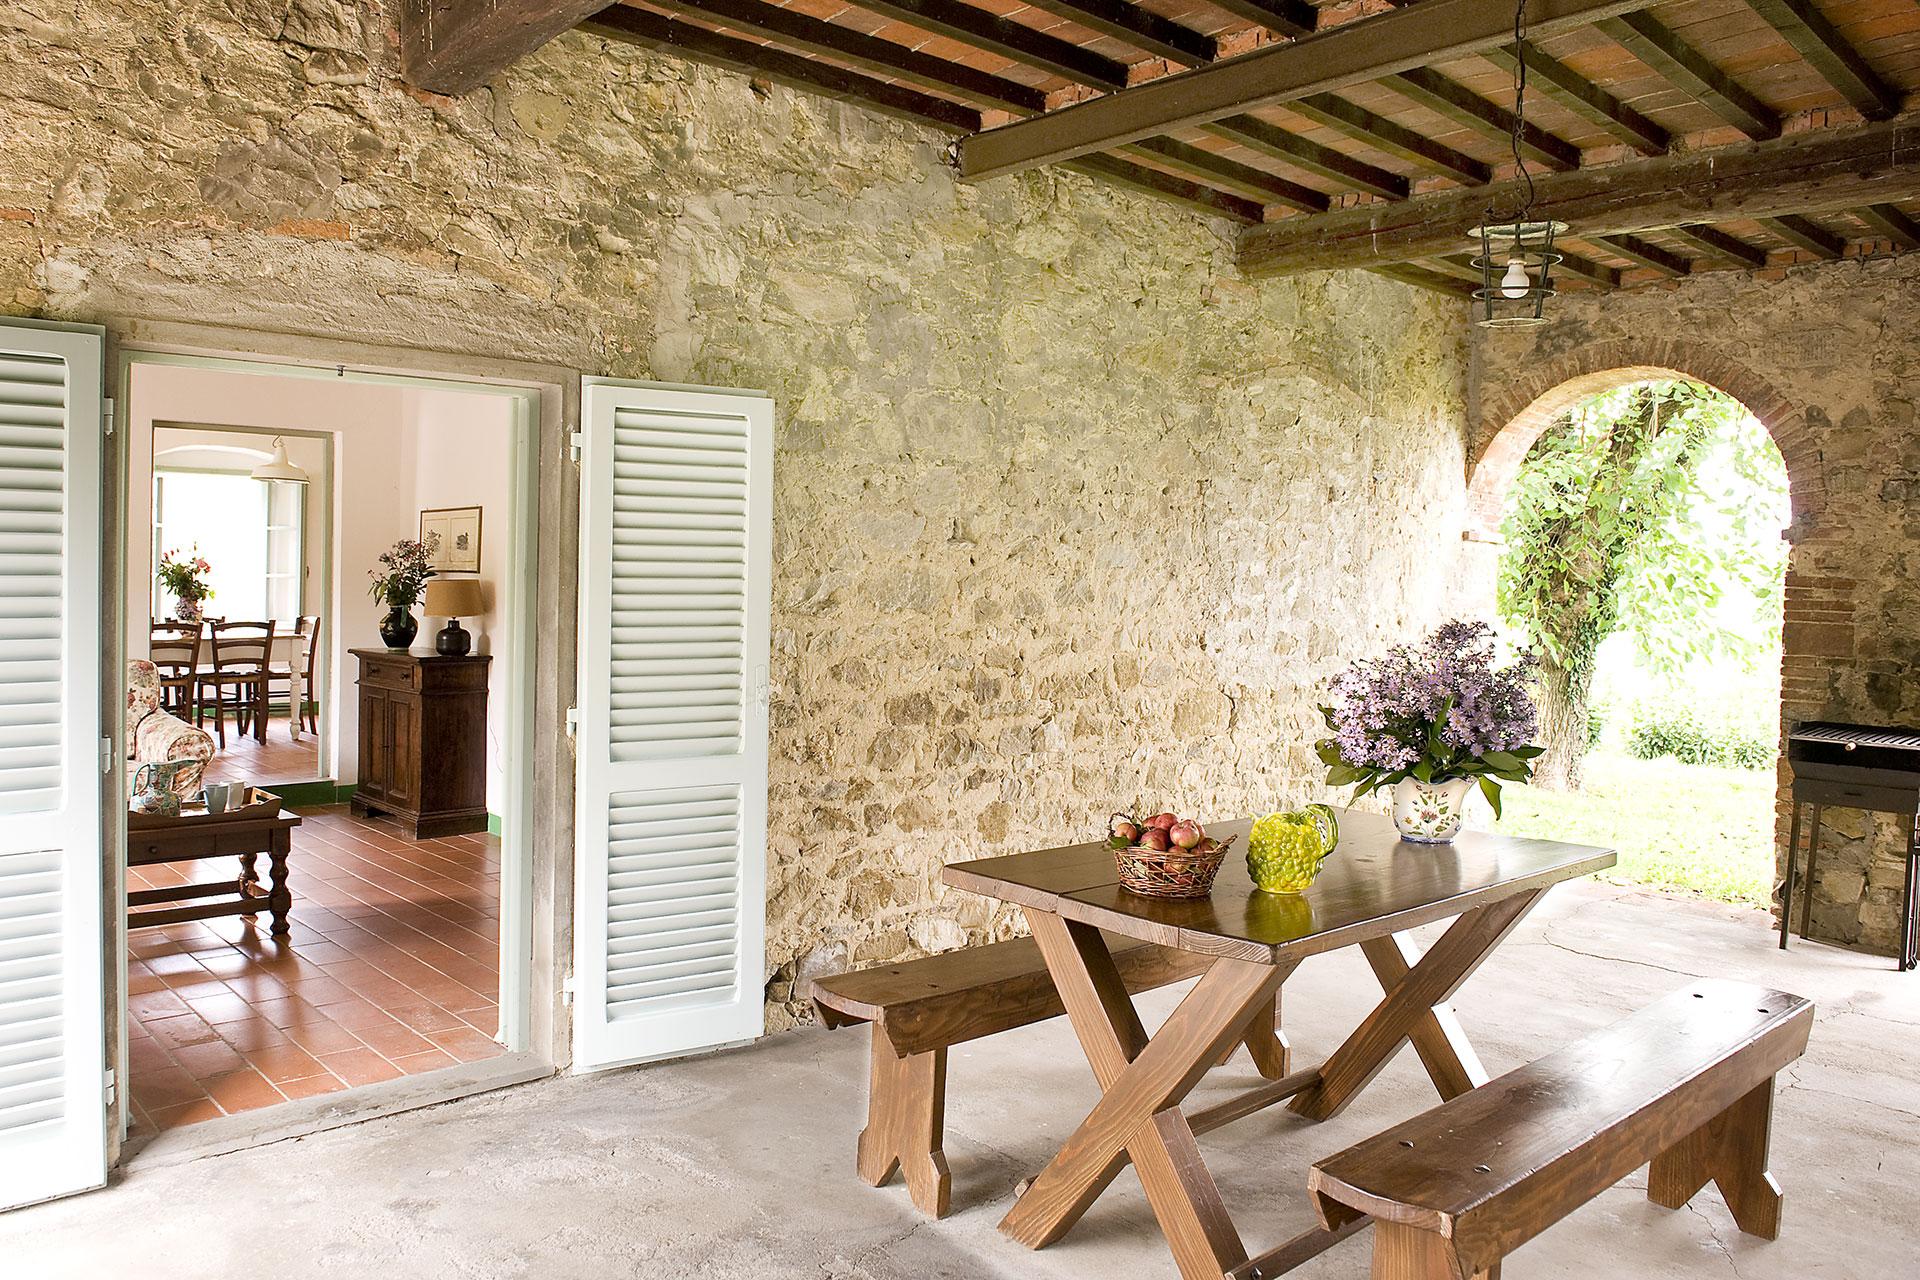 Fraschetta casa tipica toscana fattoria casabianca for Casa in stile fattoria